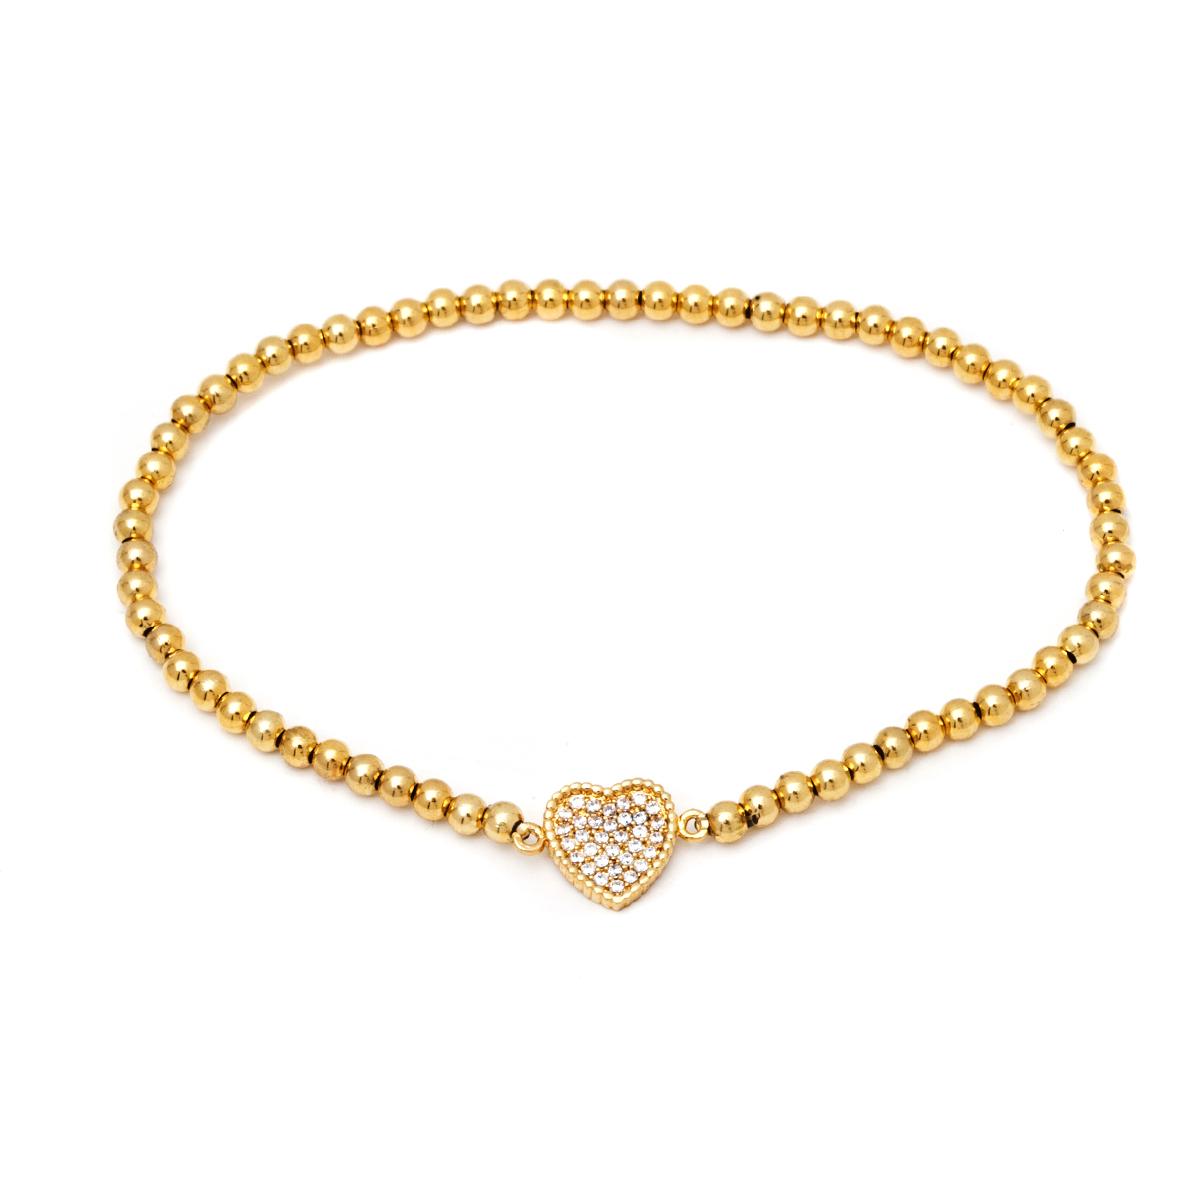 18K Gold and Swarovski Elements Heat Bead Bracelet